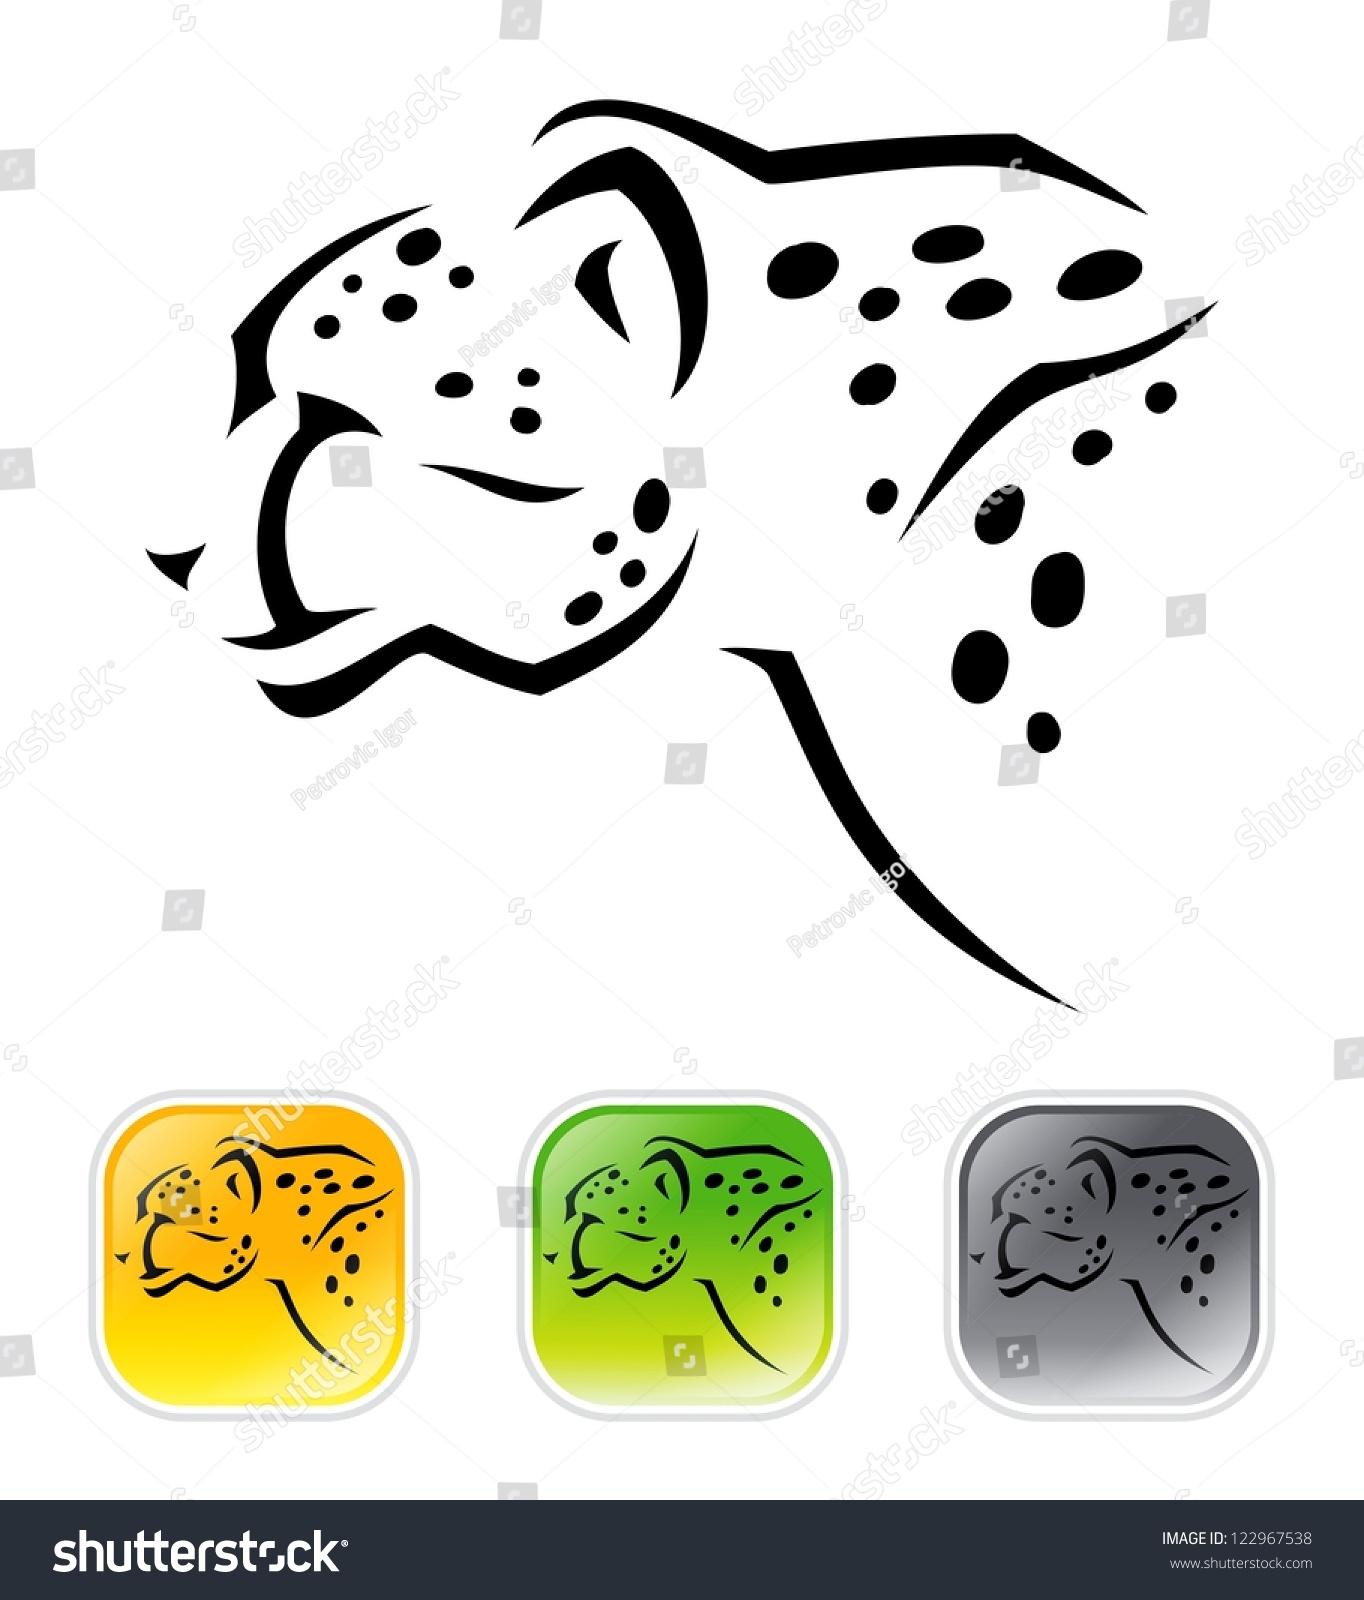 Chester Cheetah Illustrations On Behance: Cheetah Vector Illustration Stock Vector 122967538